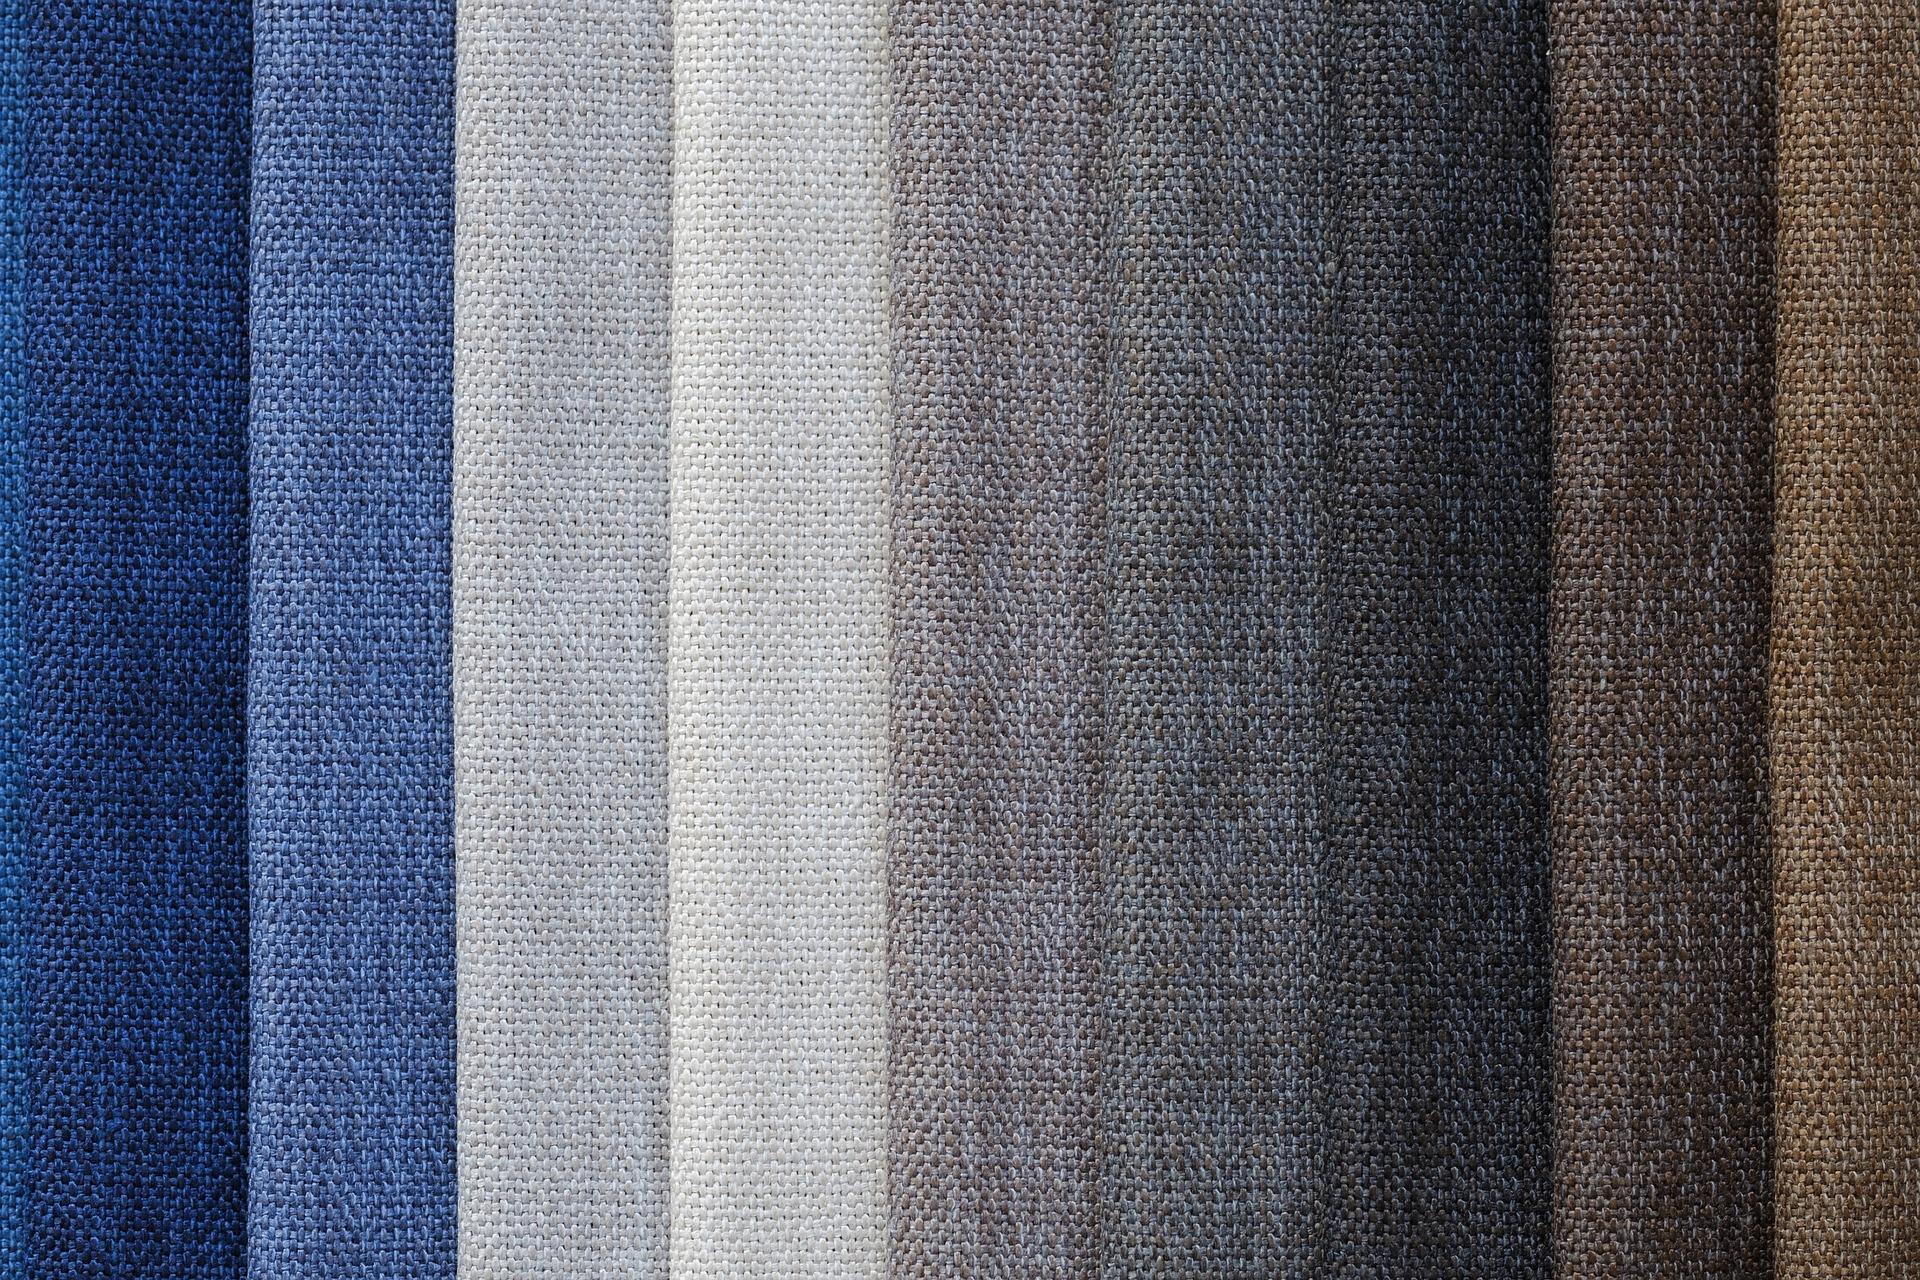 fabric-3506846_1920.jpg